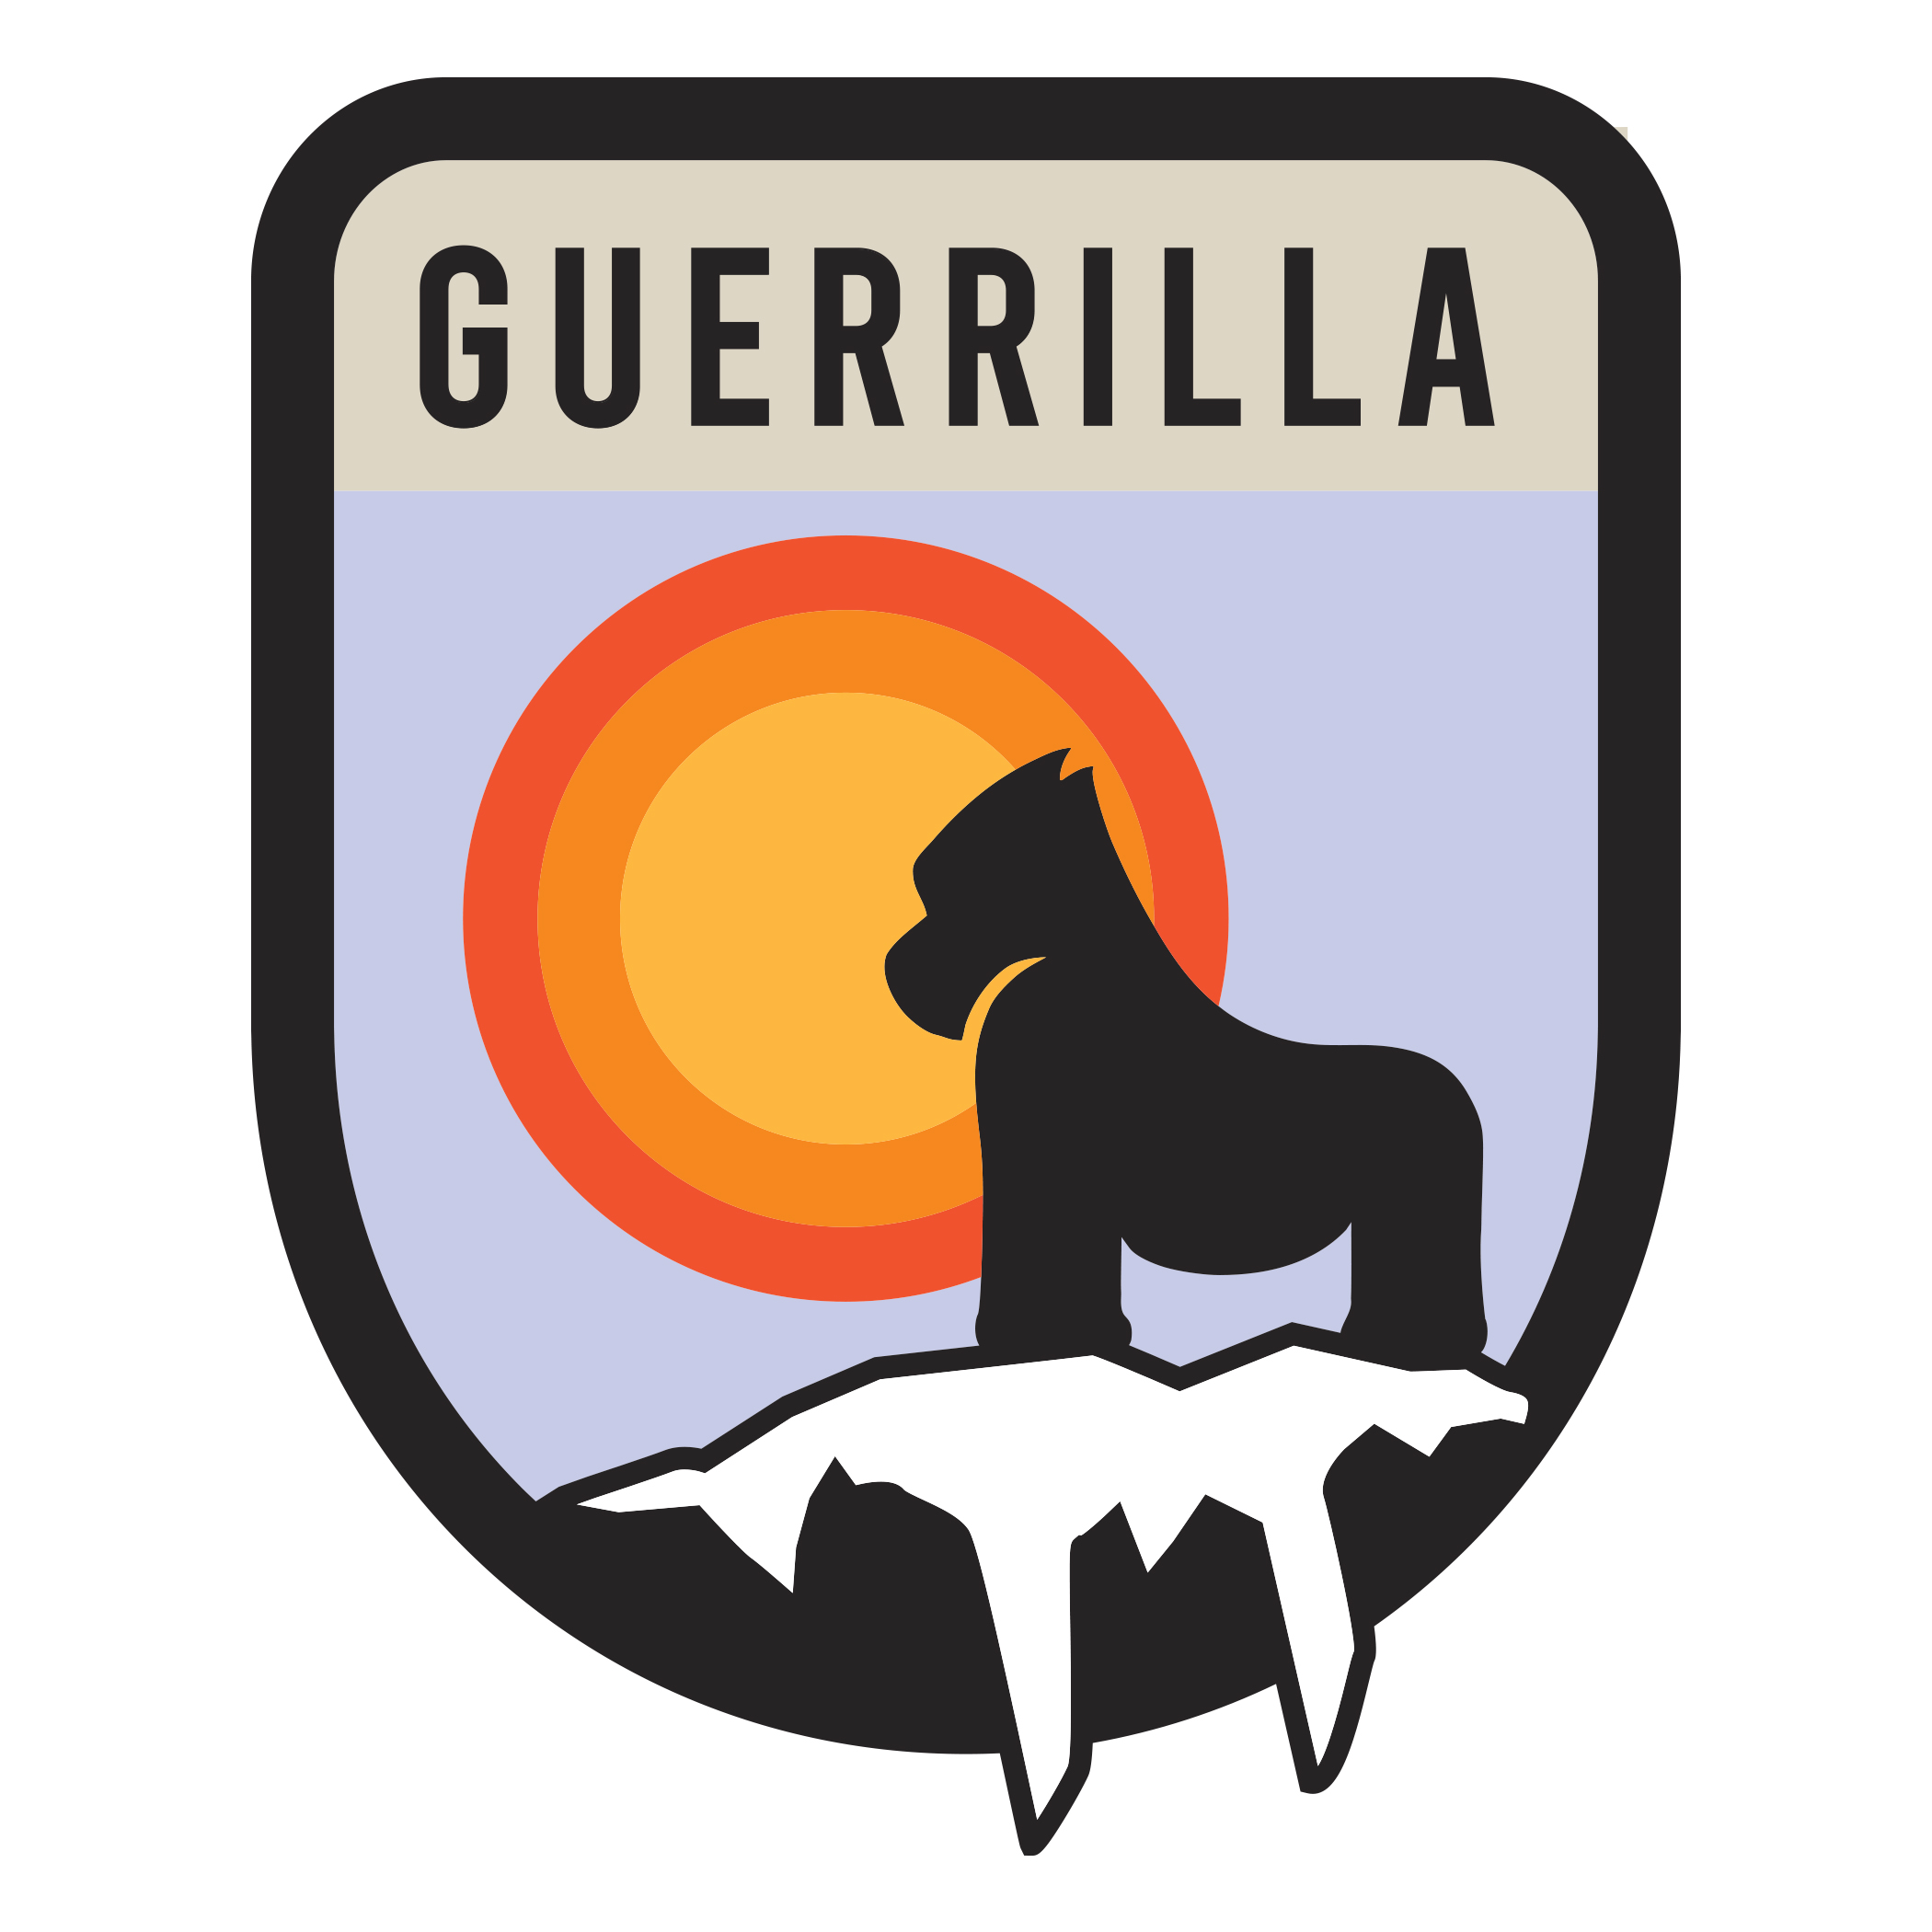 Guerrilla Icicle